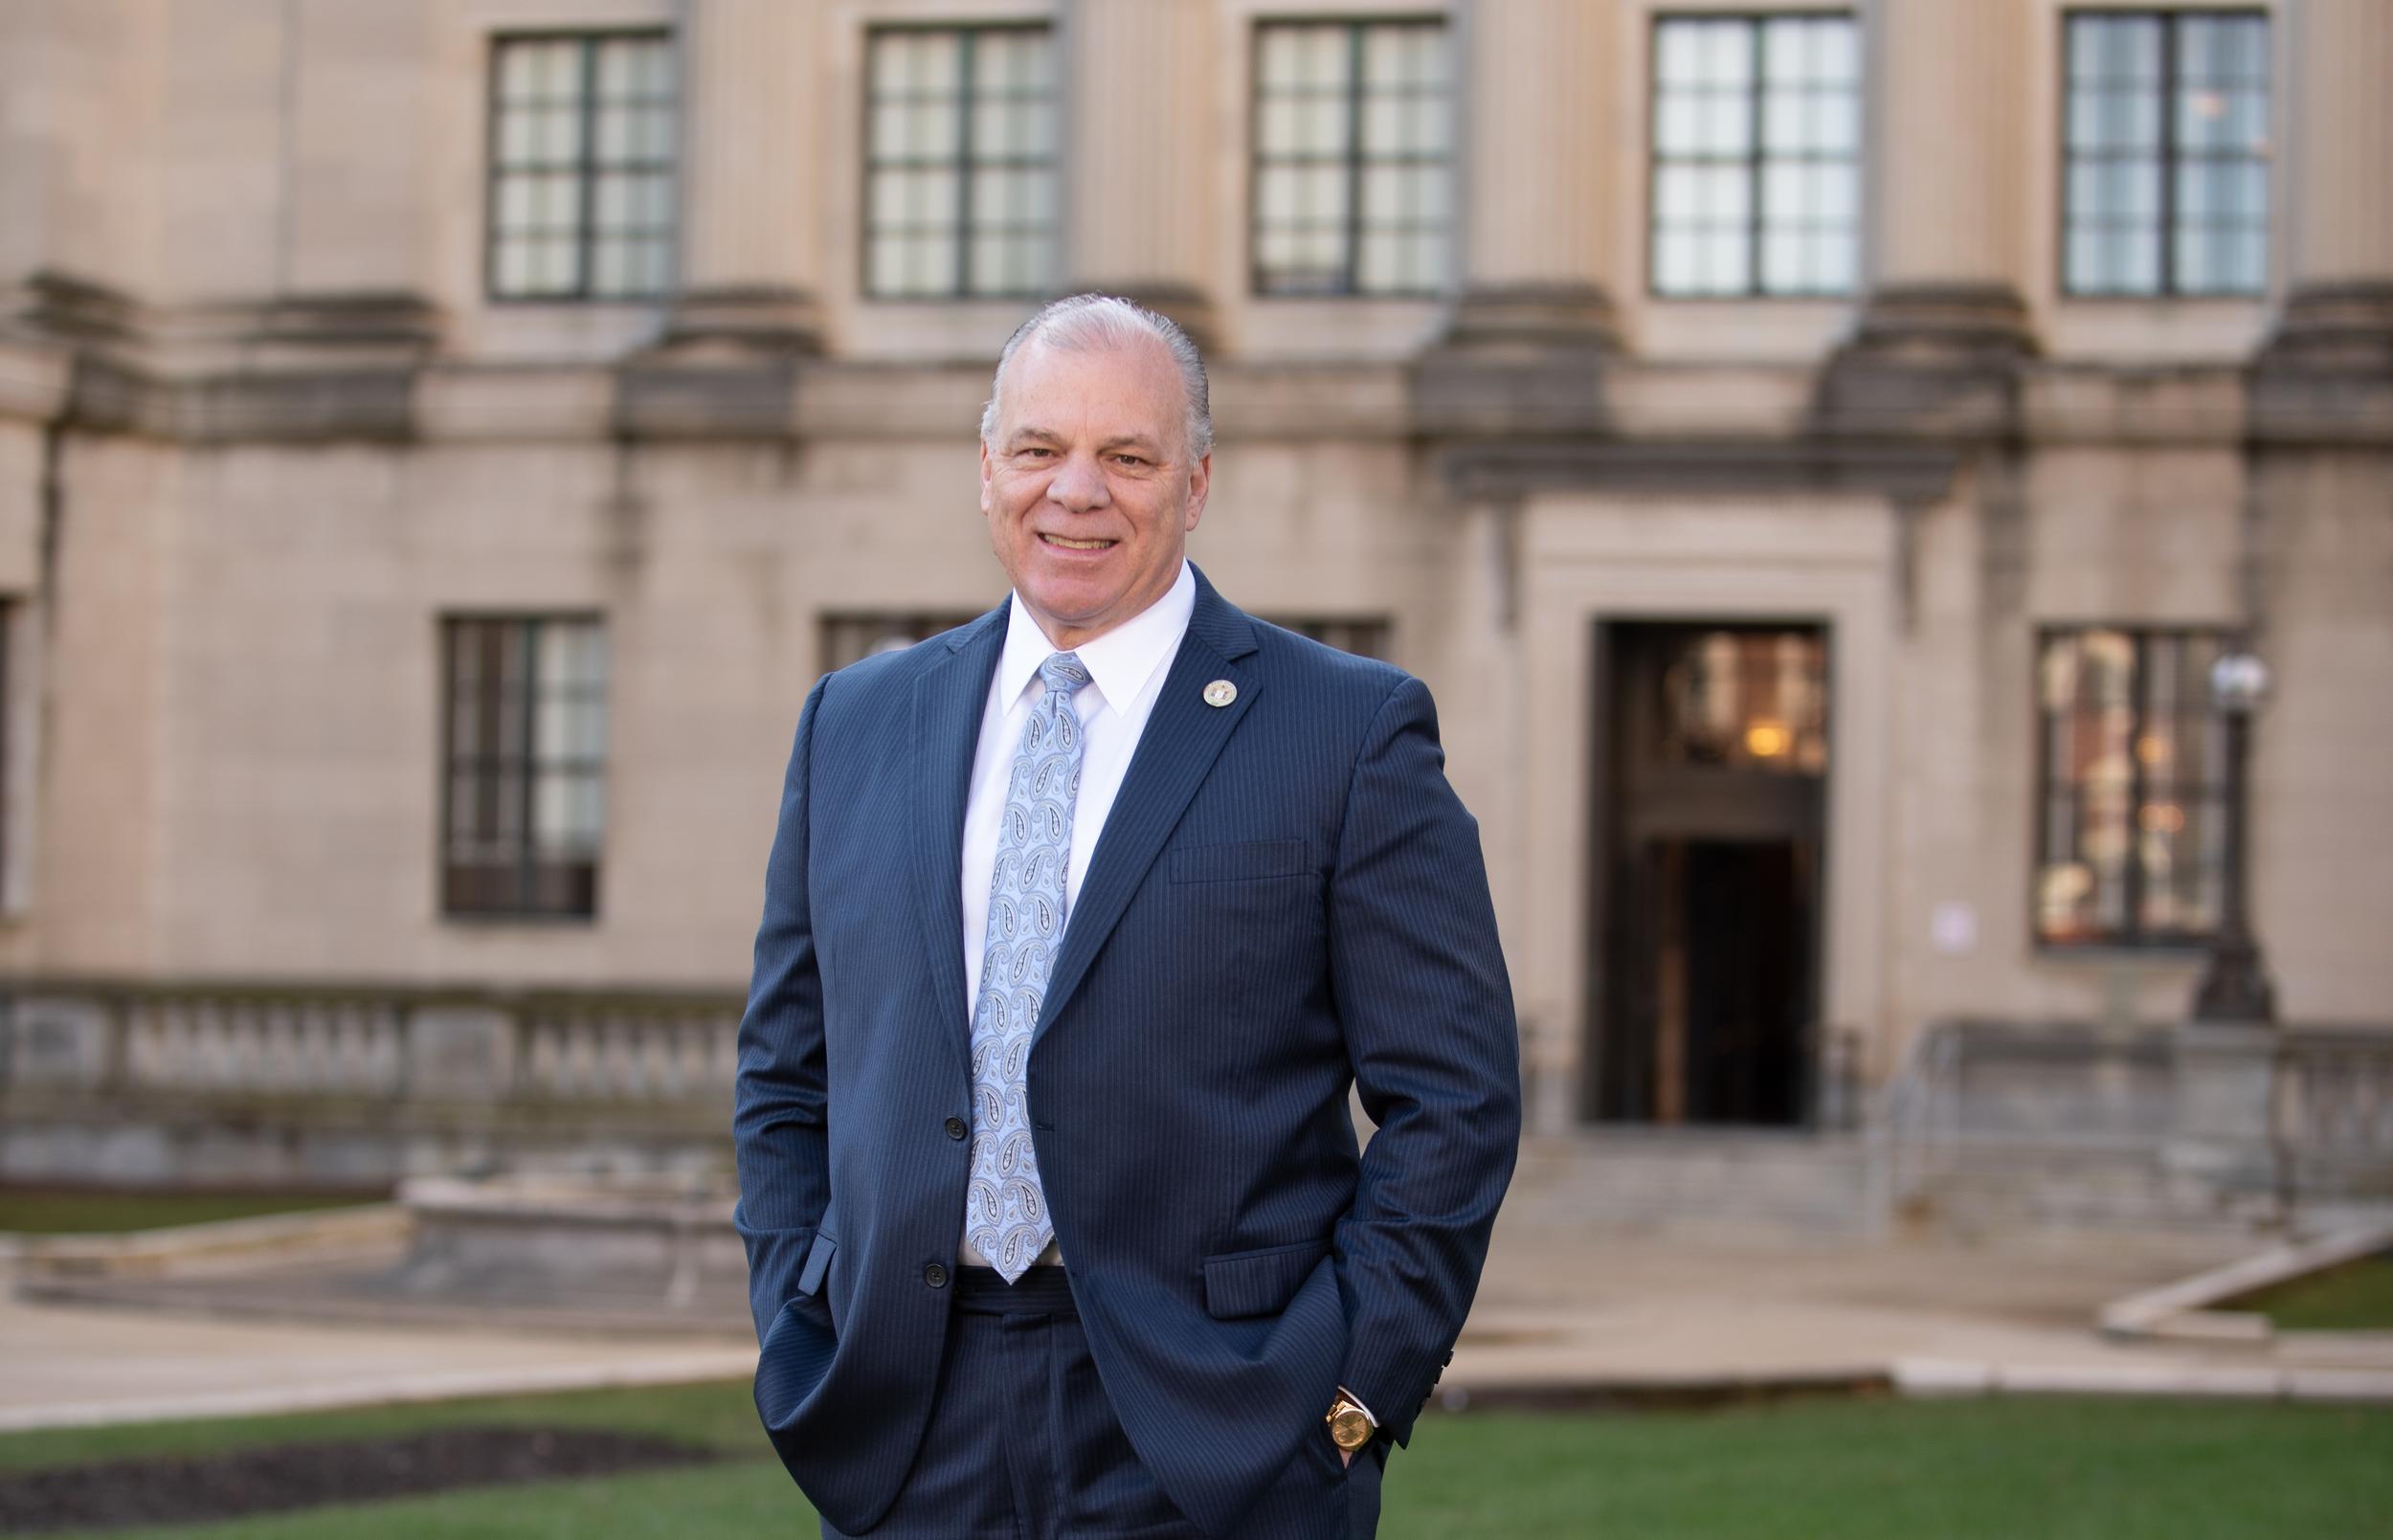 Steve Sweeney - New Jersey Senate President